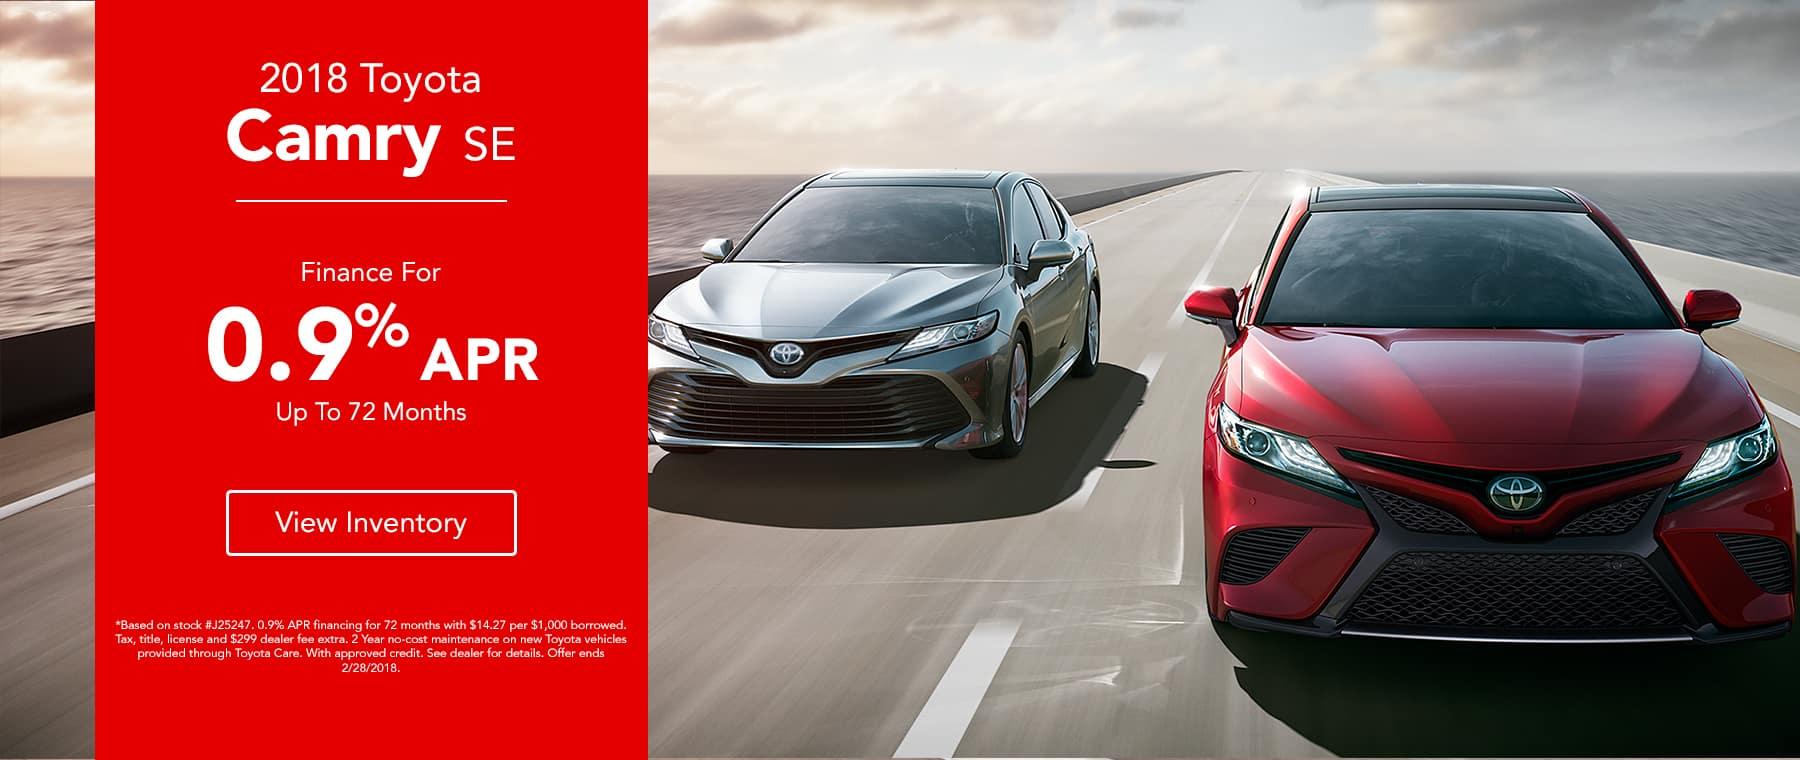 Legends Toyota - 0.9% Financing